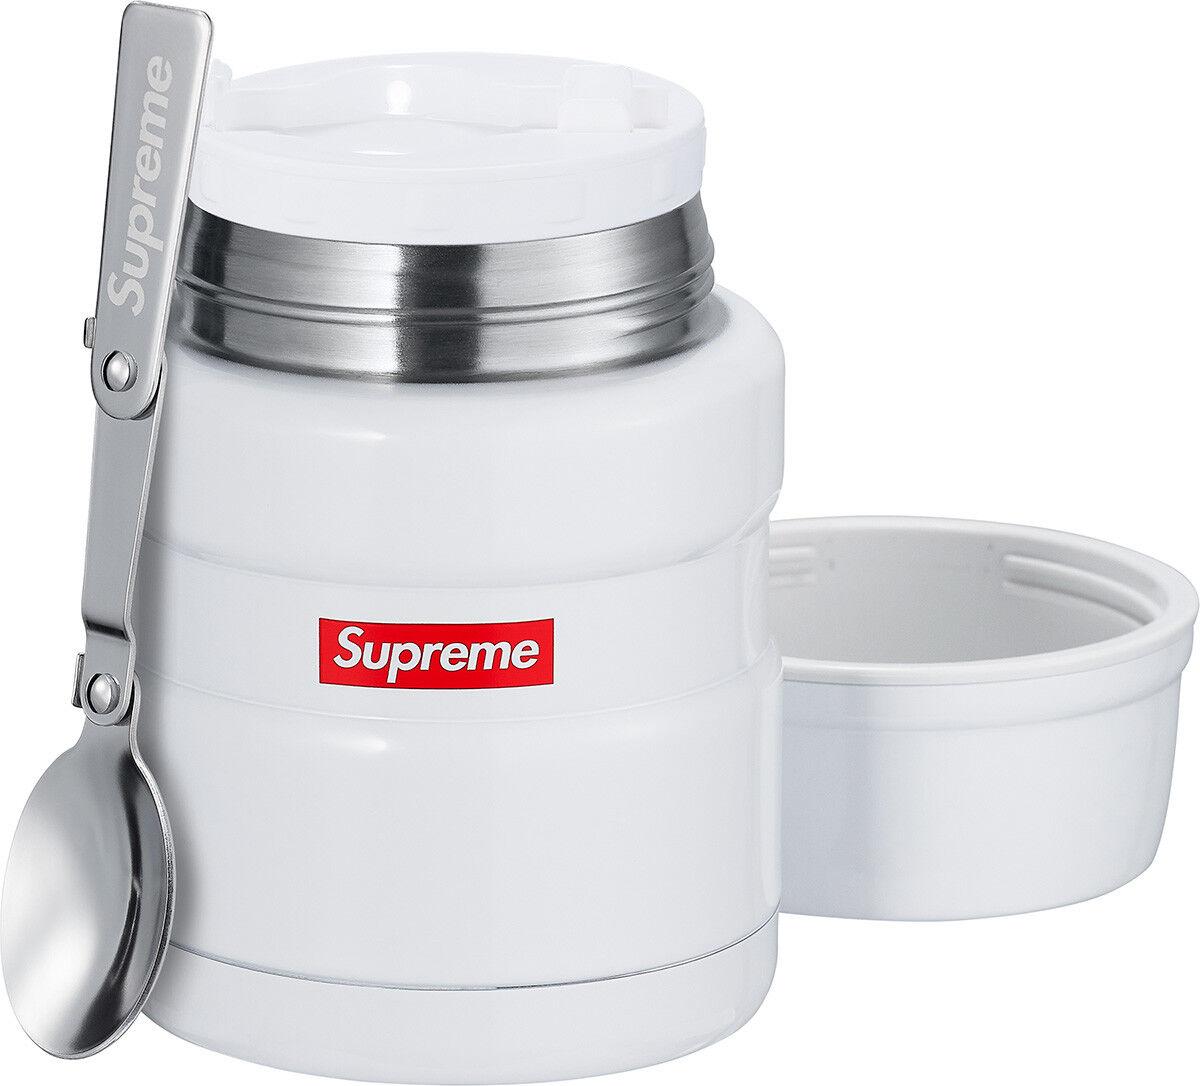 Supreme Thermos Stainless King Food Jar et cuillère Scellé Accessoires box logo